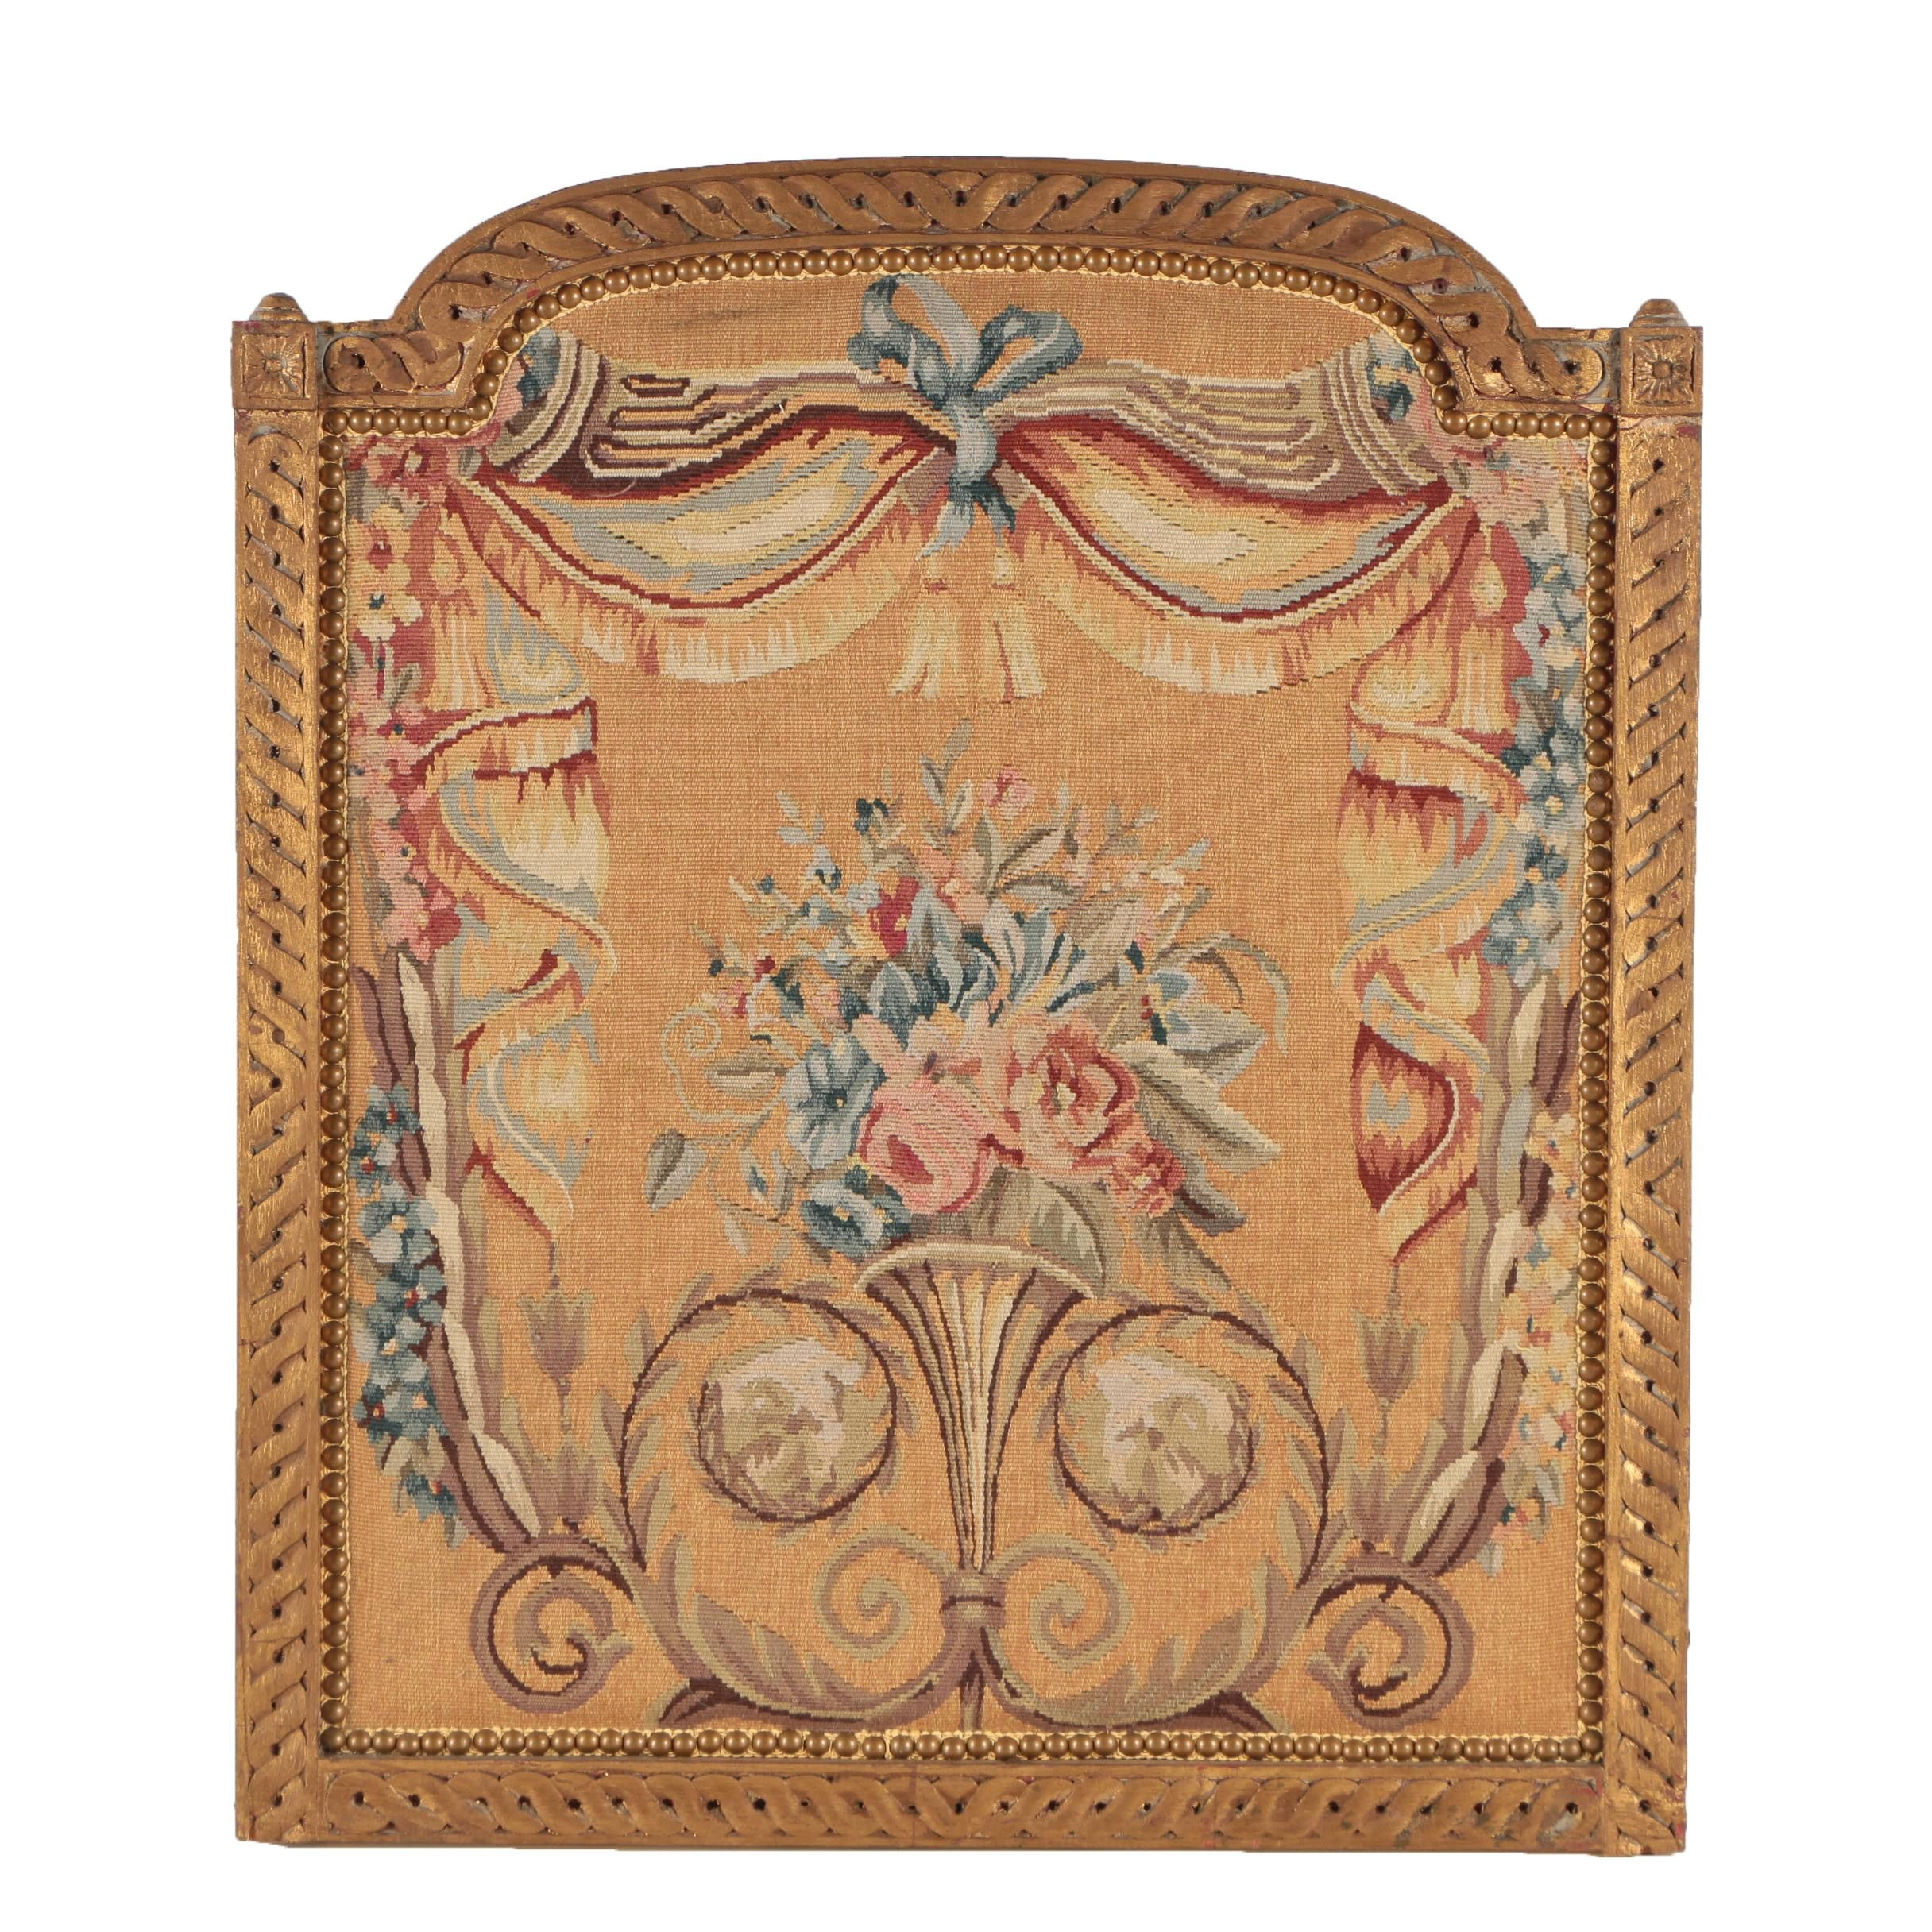 Framed Tapestry of Floral Bouquet